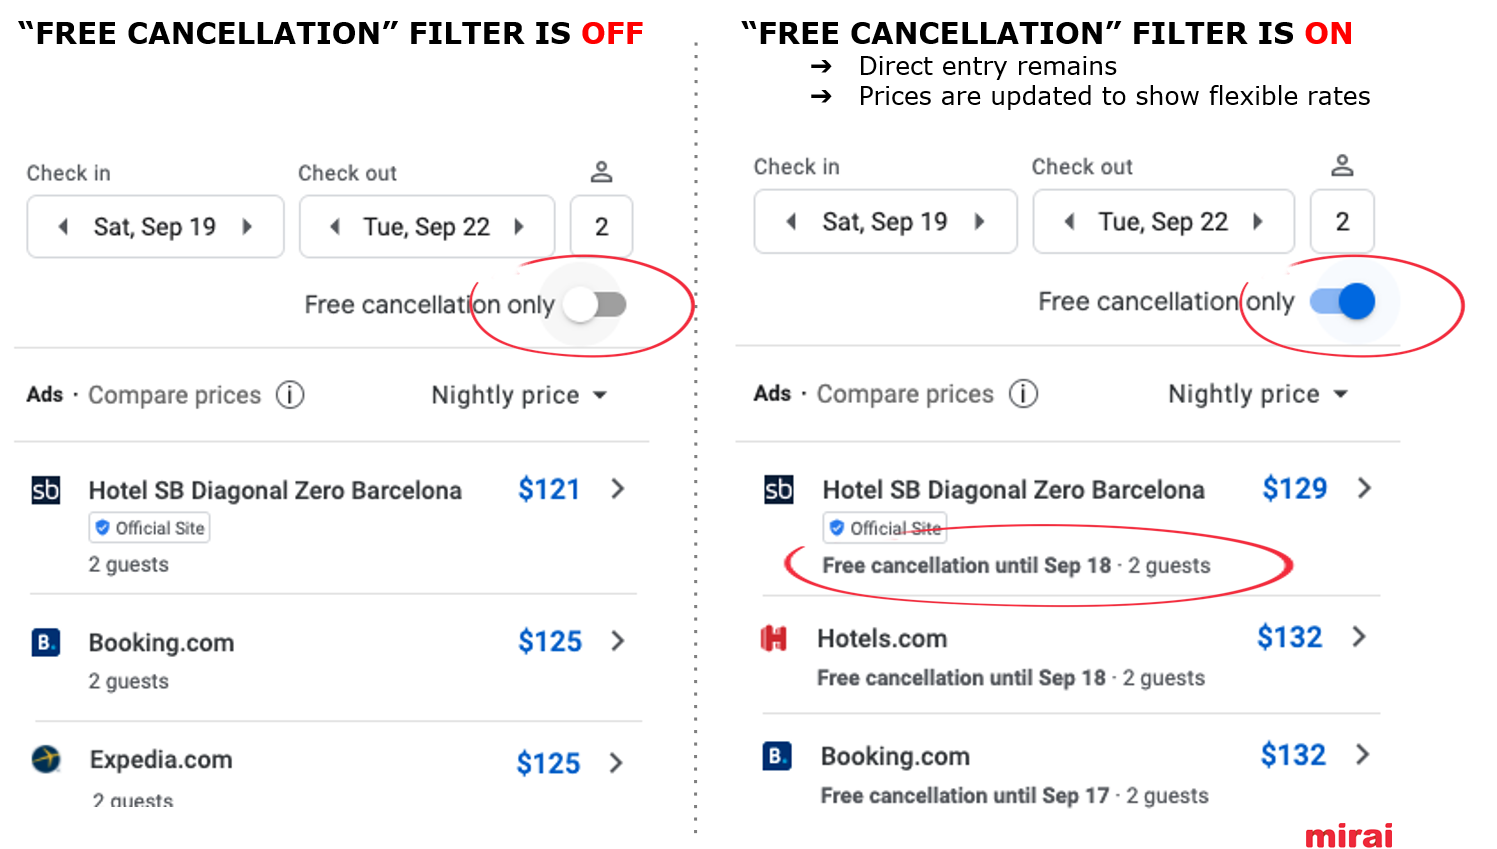 8. Free cancellation filter in Google Hotel Ads - Mirai